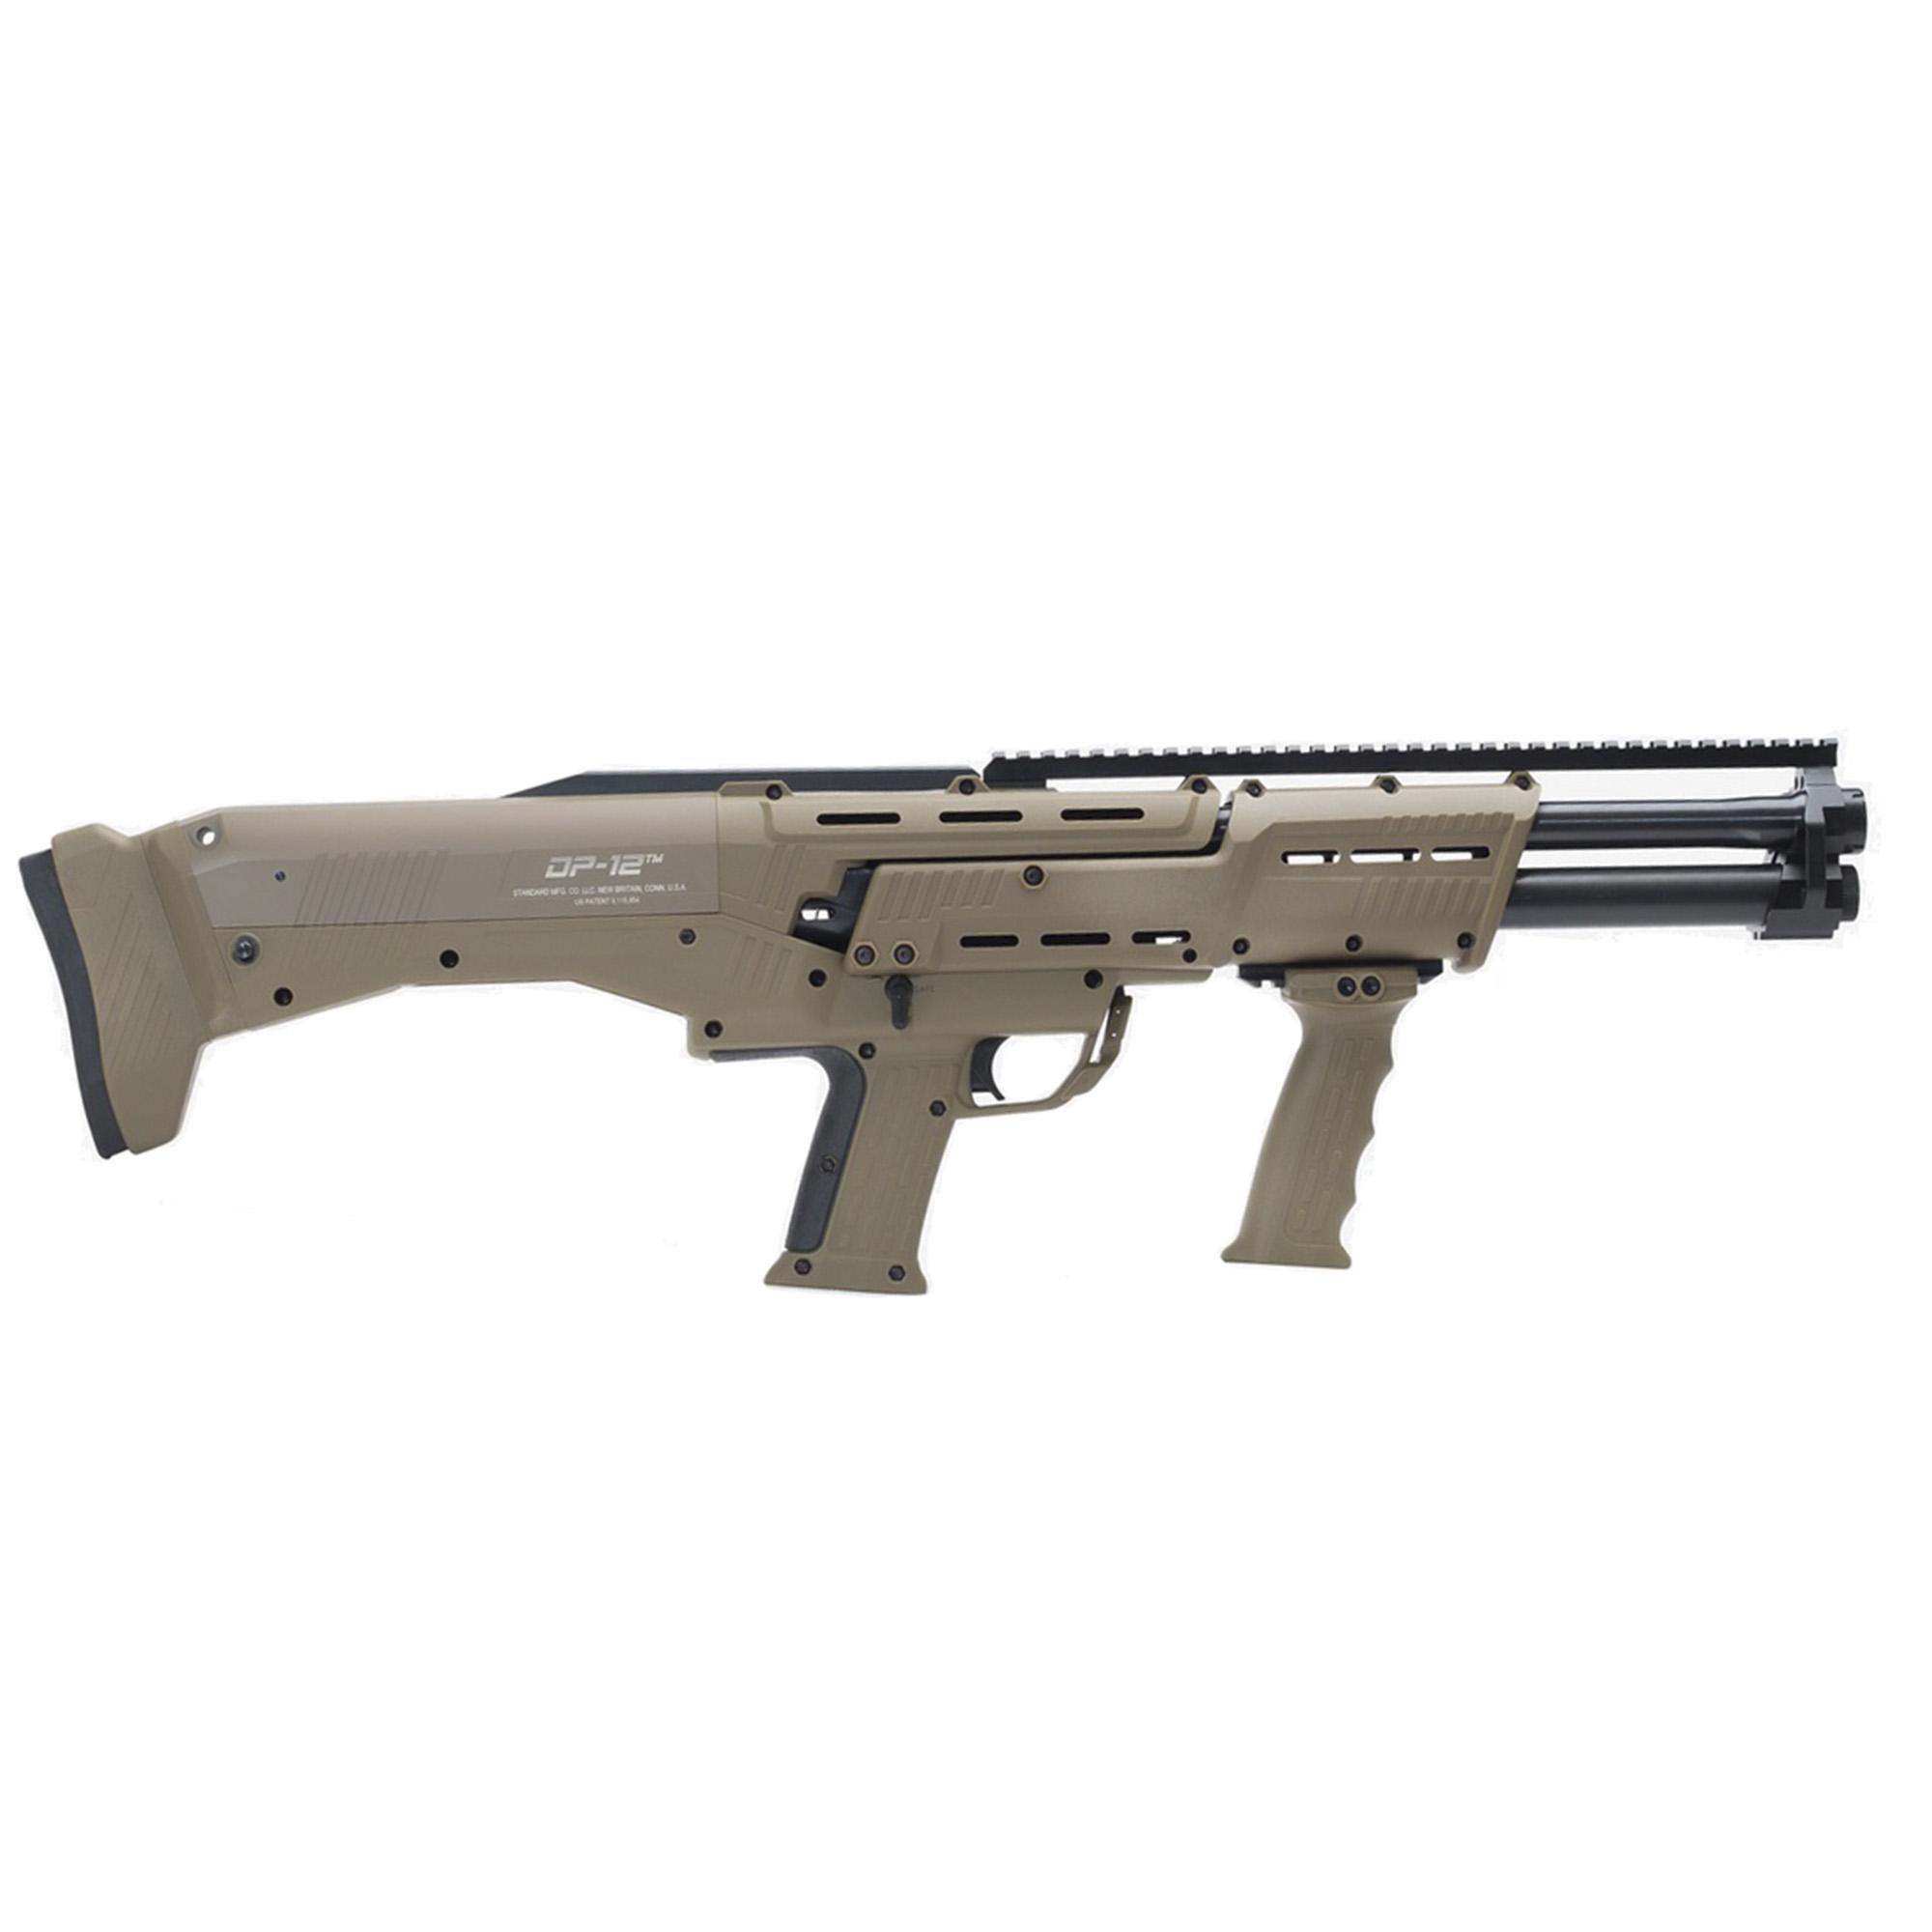 Standard Mfg. DP-12 Shotgun, 12 Ga, Tan